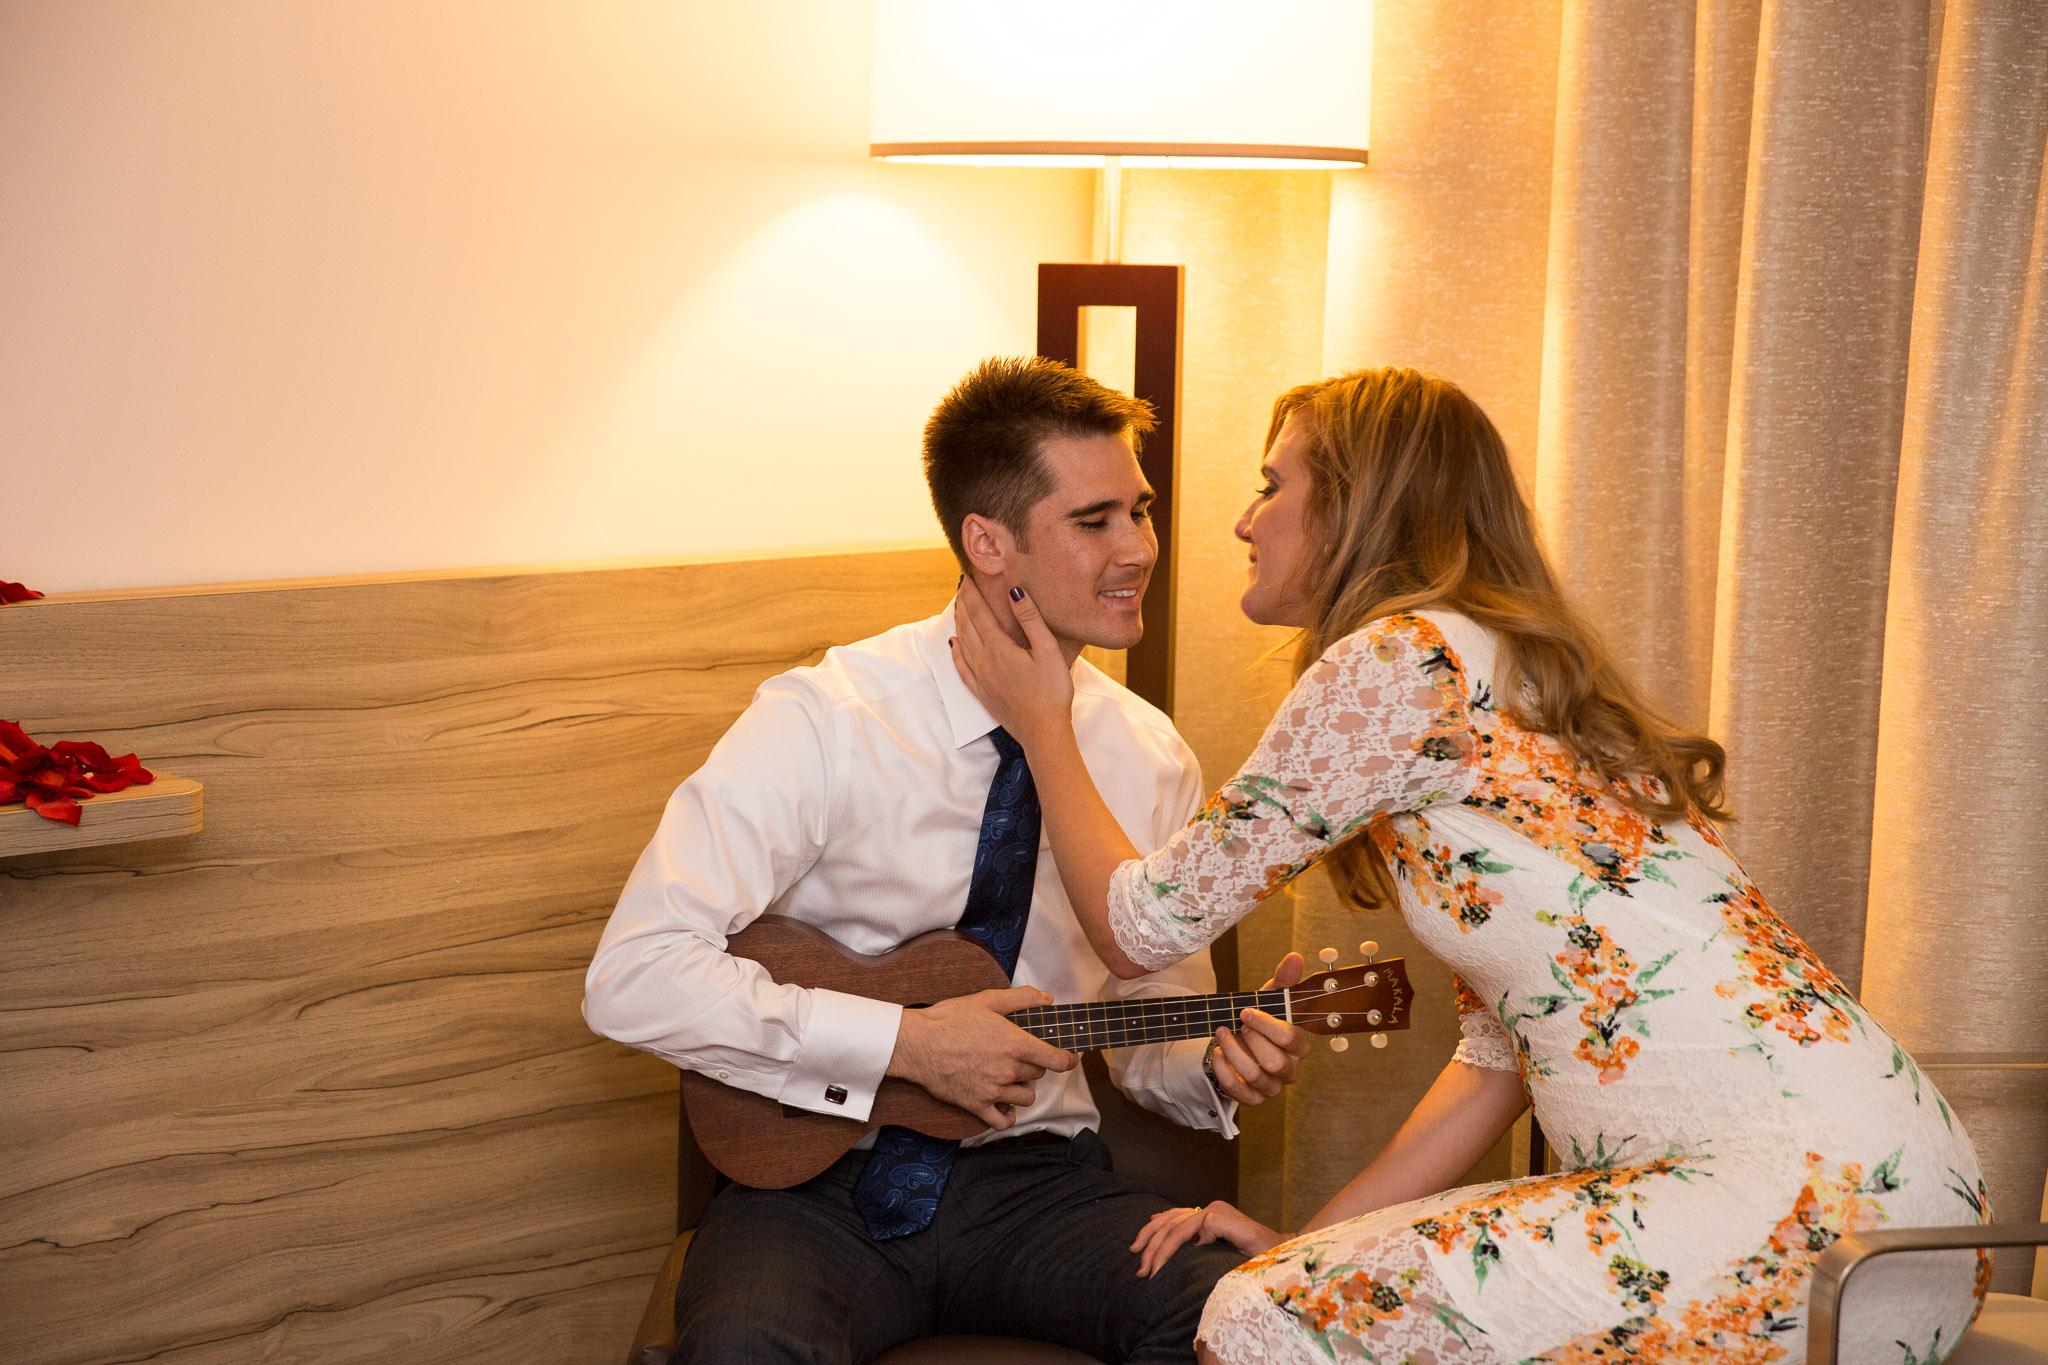 marriage-proposal-idea-las-vegas